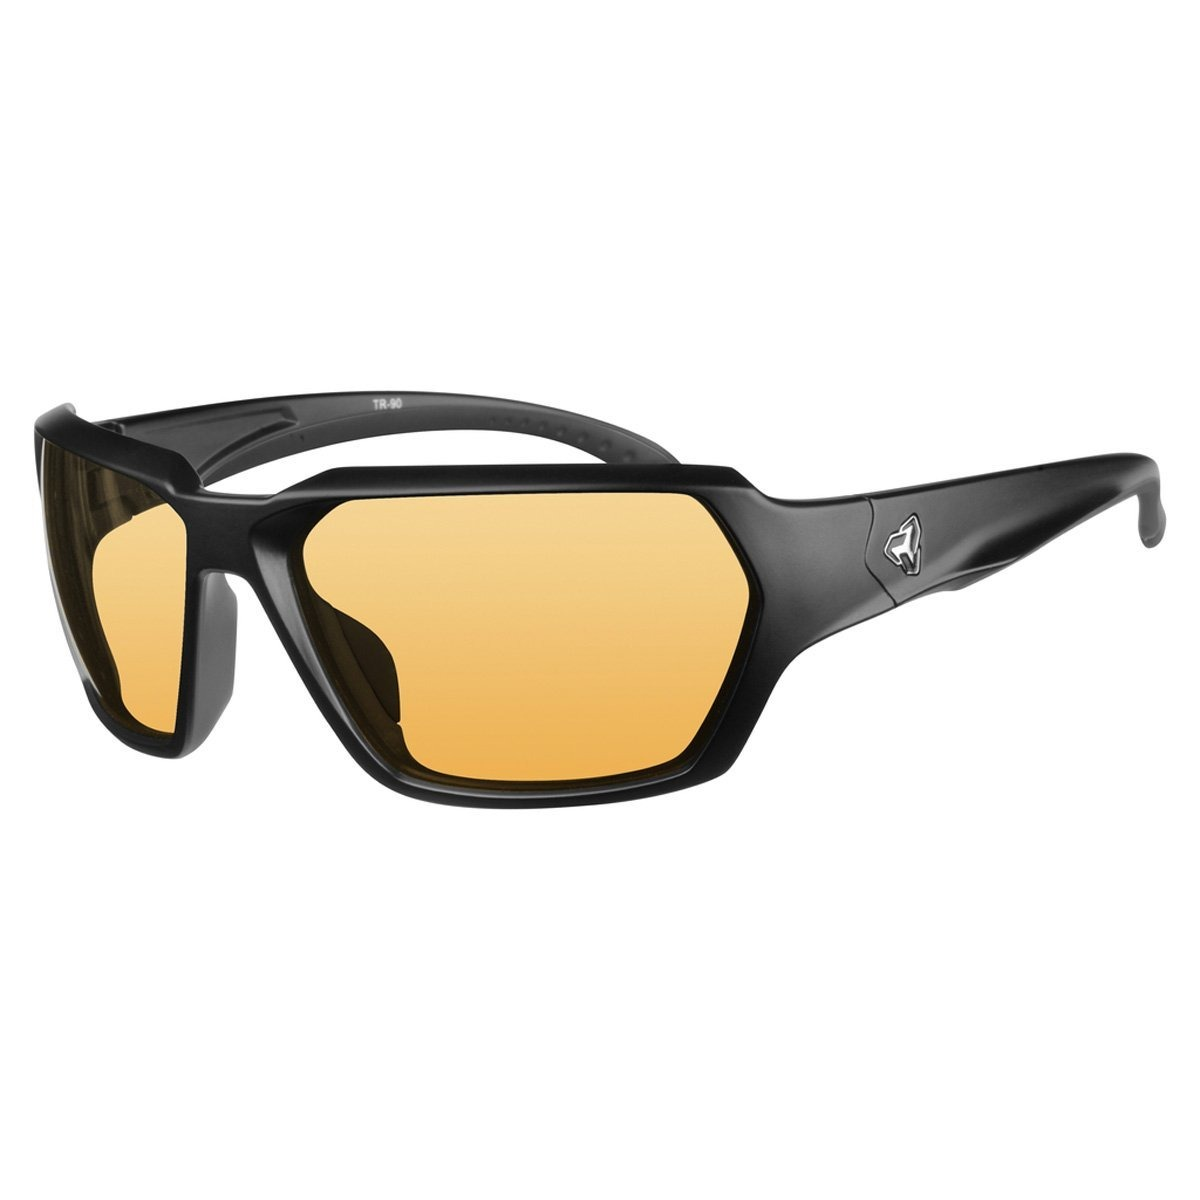 b512d47d62 Gafas De Sol Fotocromaticas Ryders Eyewear Face - $ 314.777 en ...